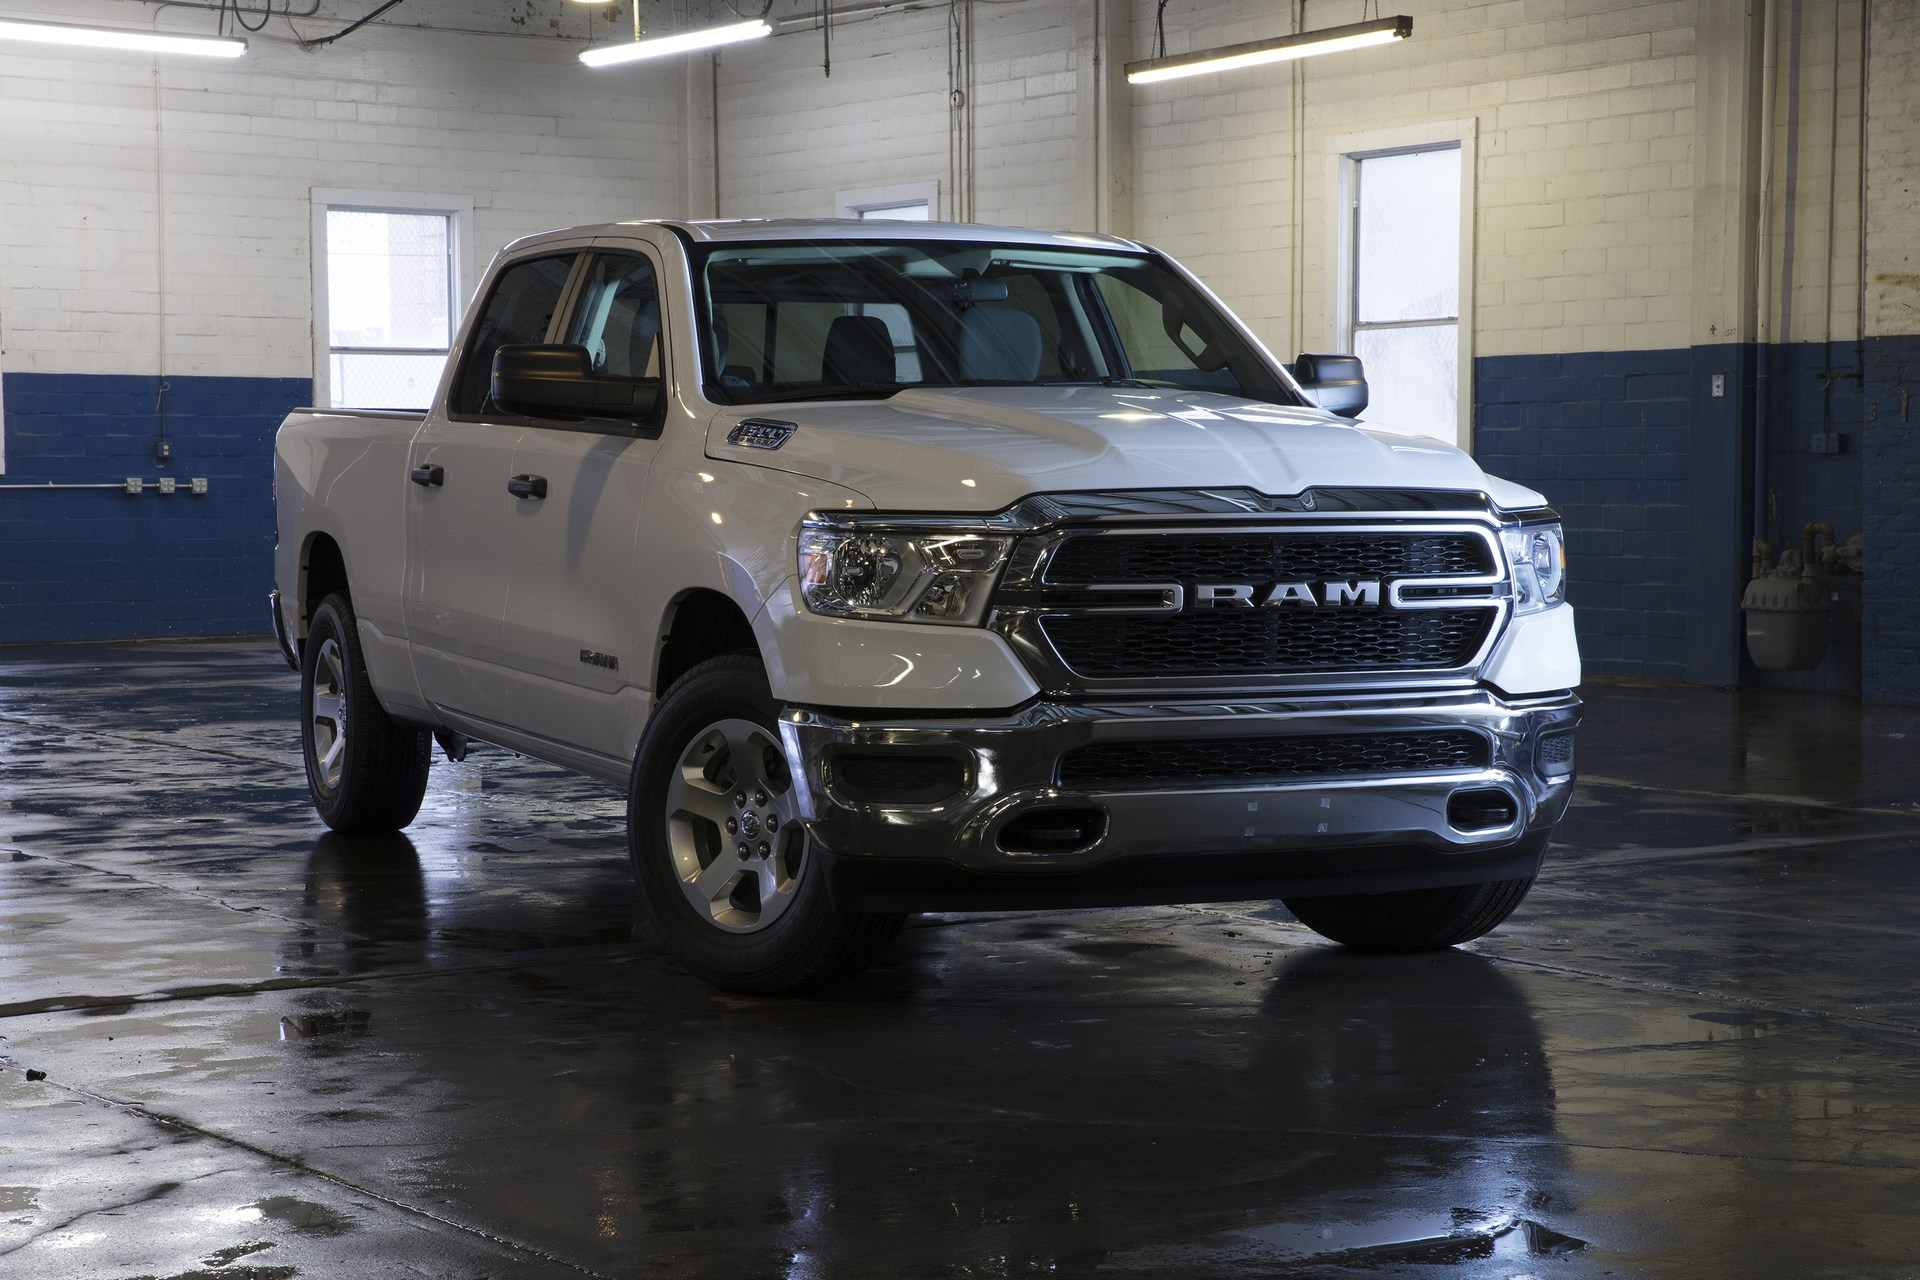 2019 Ram 1500 Tradesman Debuts With Standard Mild Hybrid